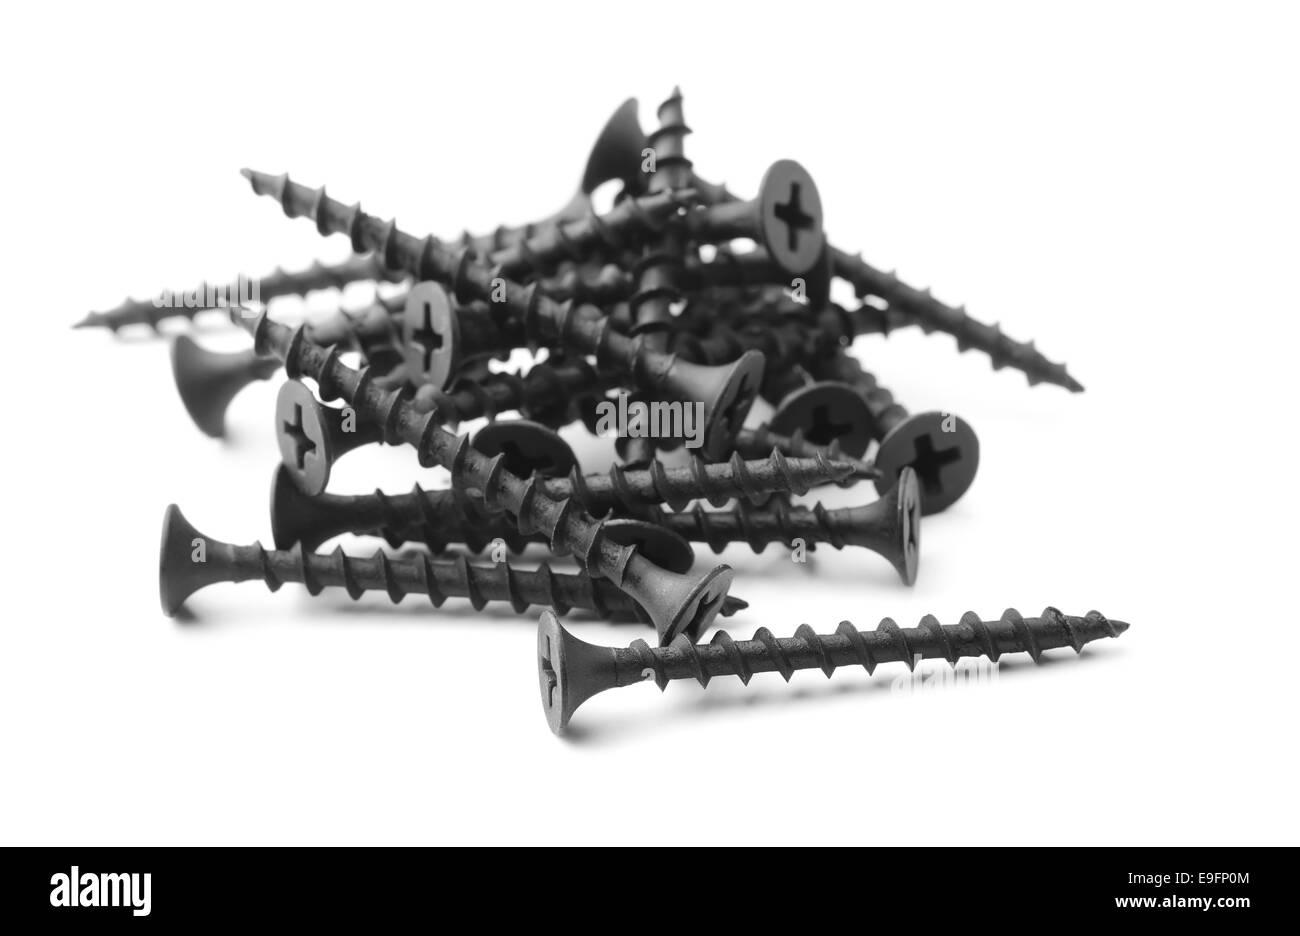 Drywall screws - Stock Image